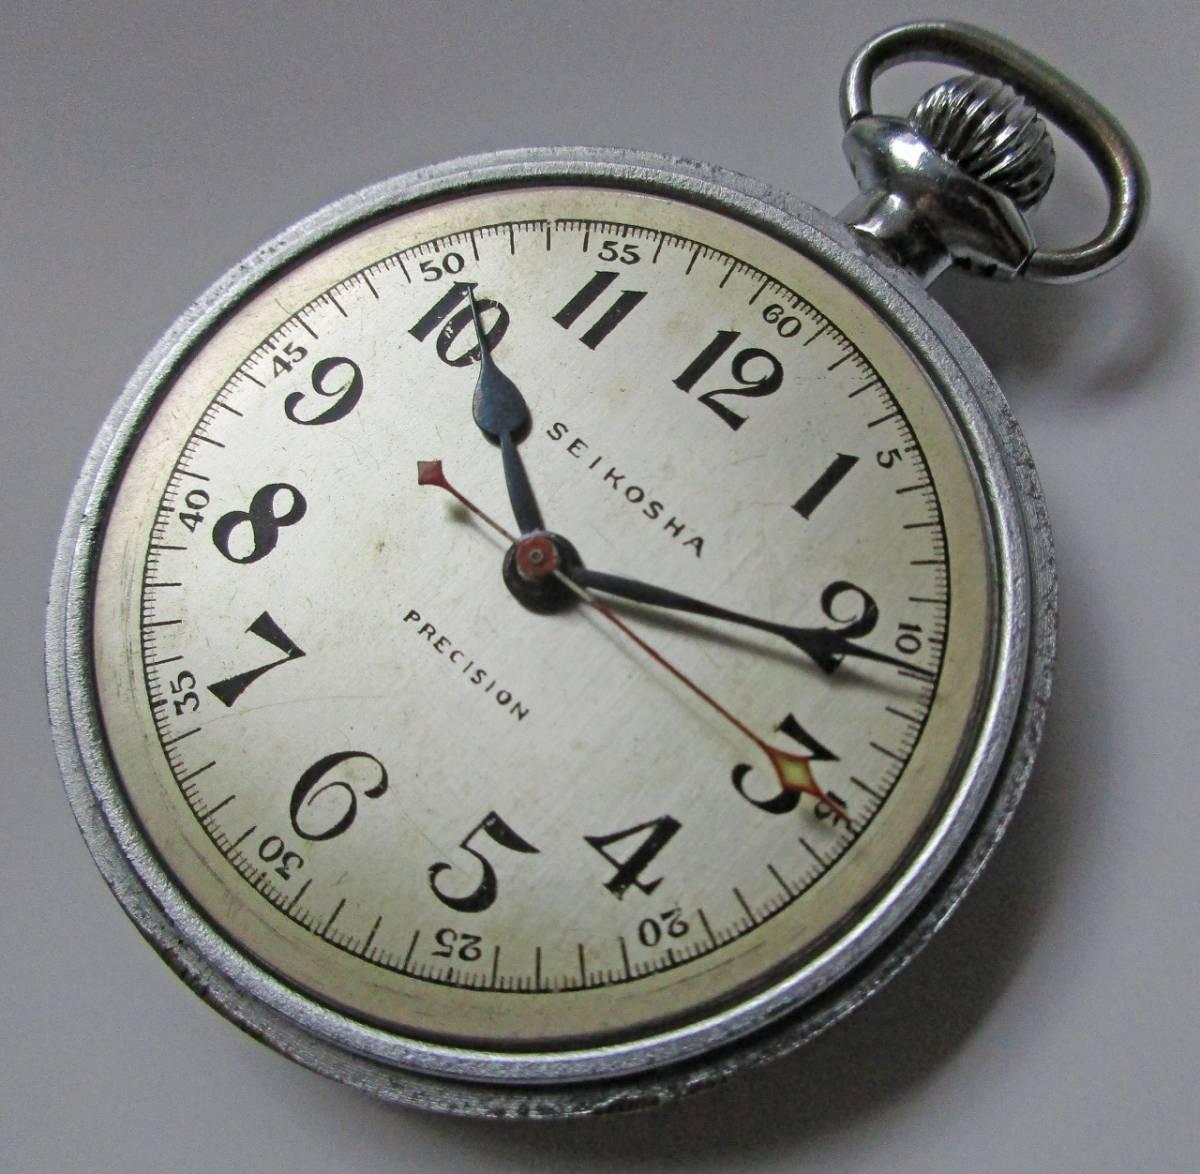 SEIKOSHA 精工舎 中三針 鉄道時計 飛行時計 鉄道局 国鉄 オーバーホール済_画像2